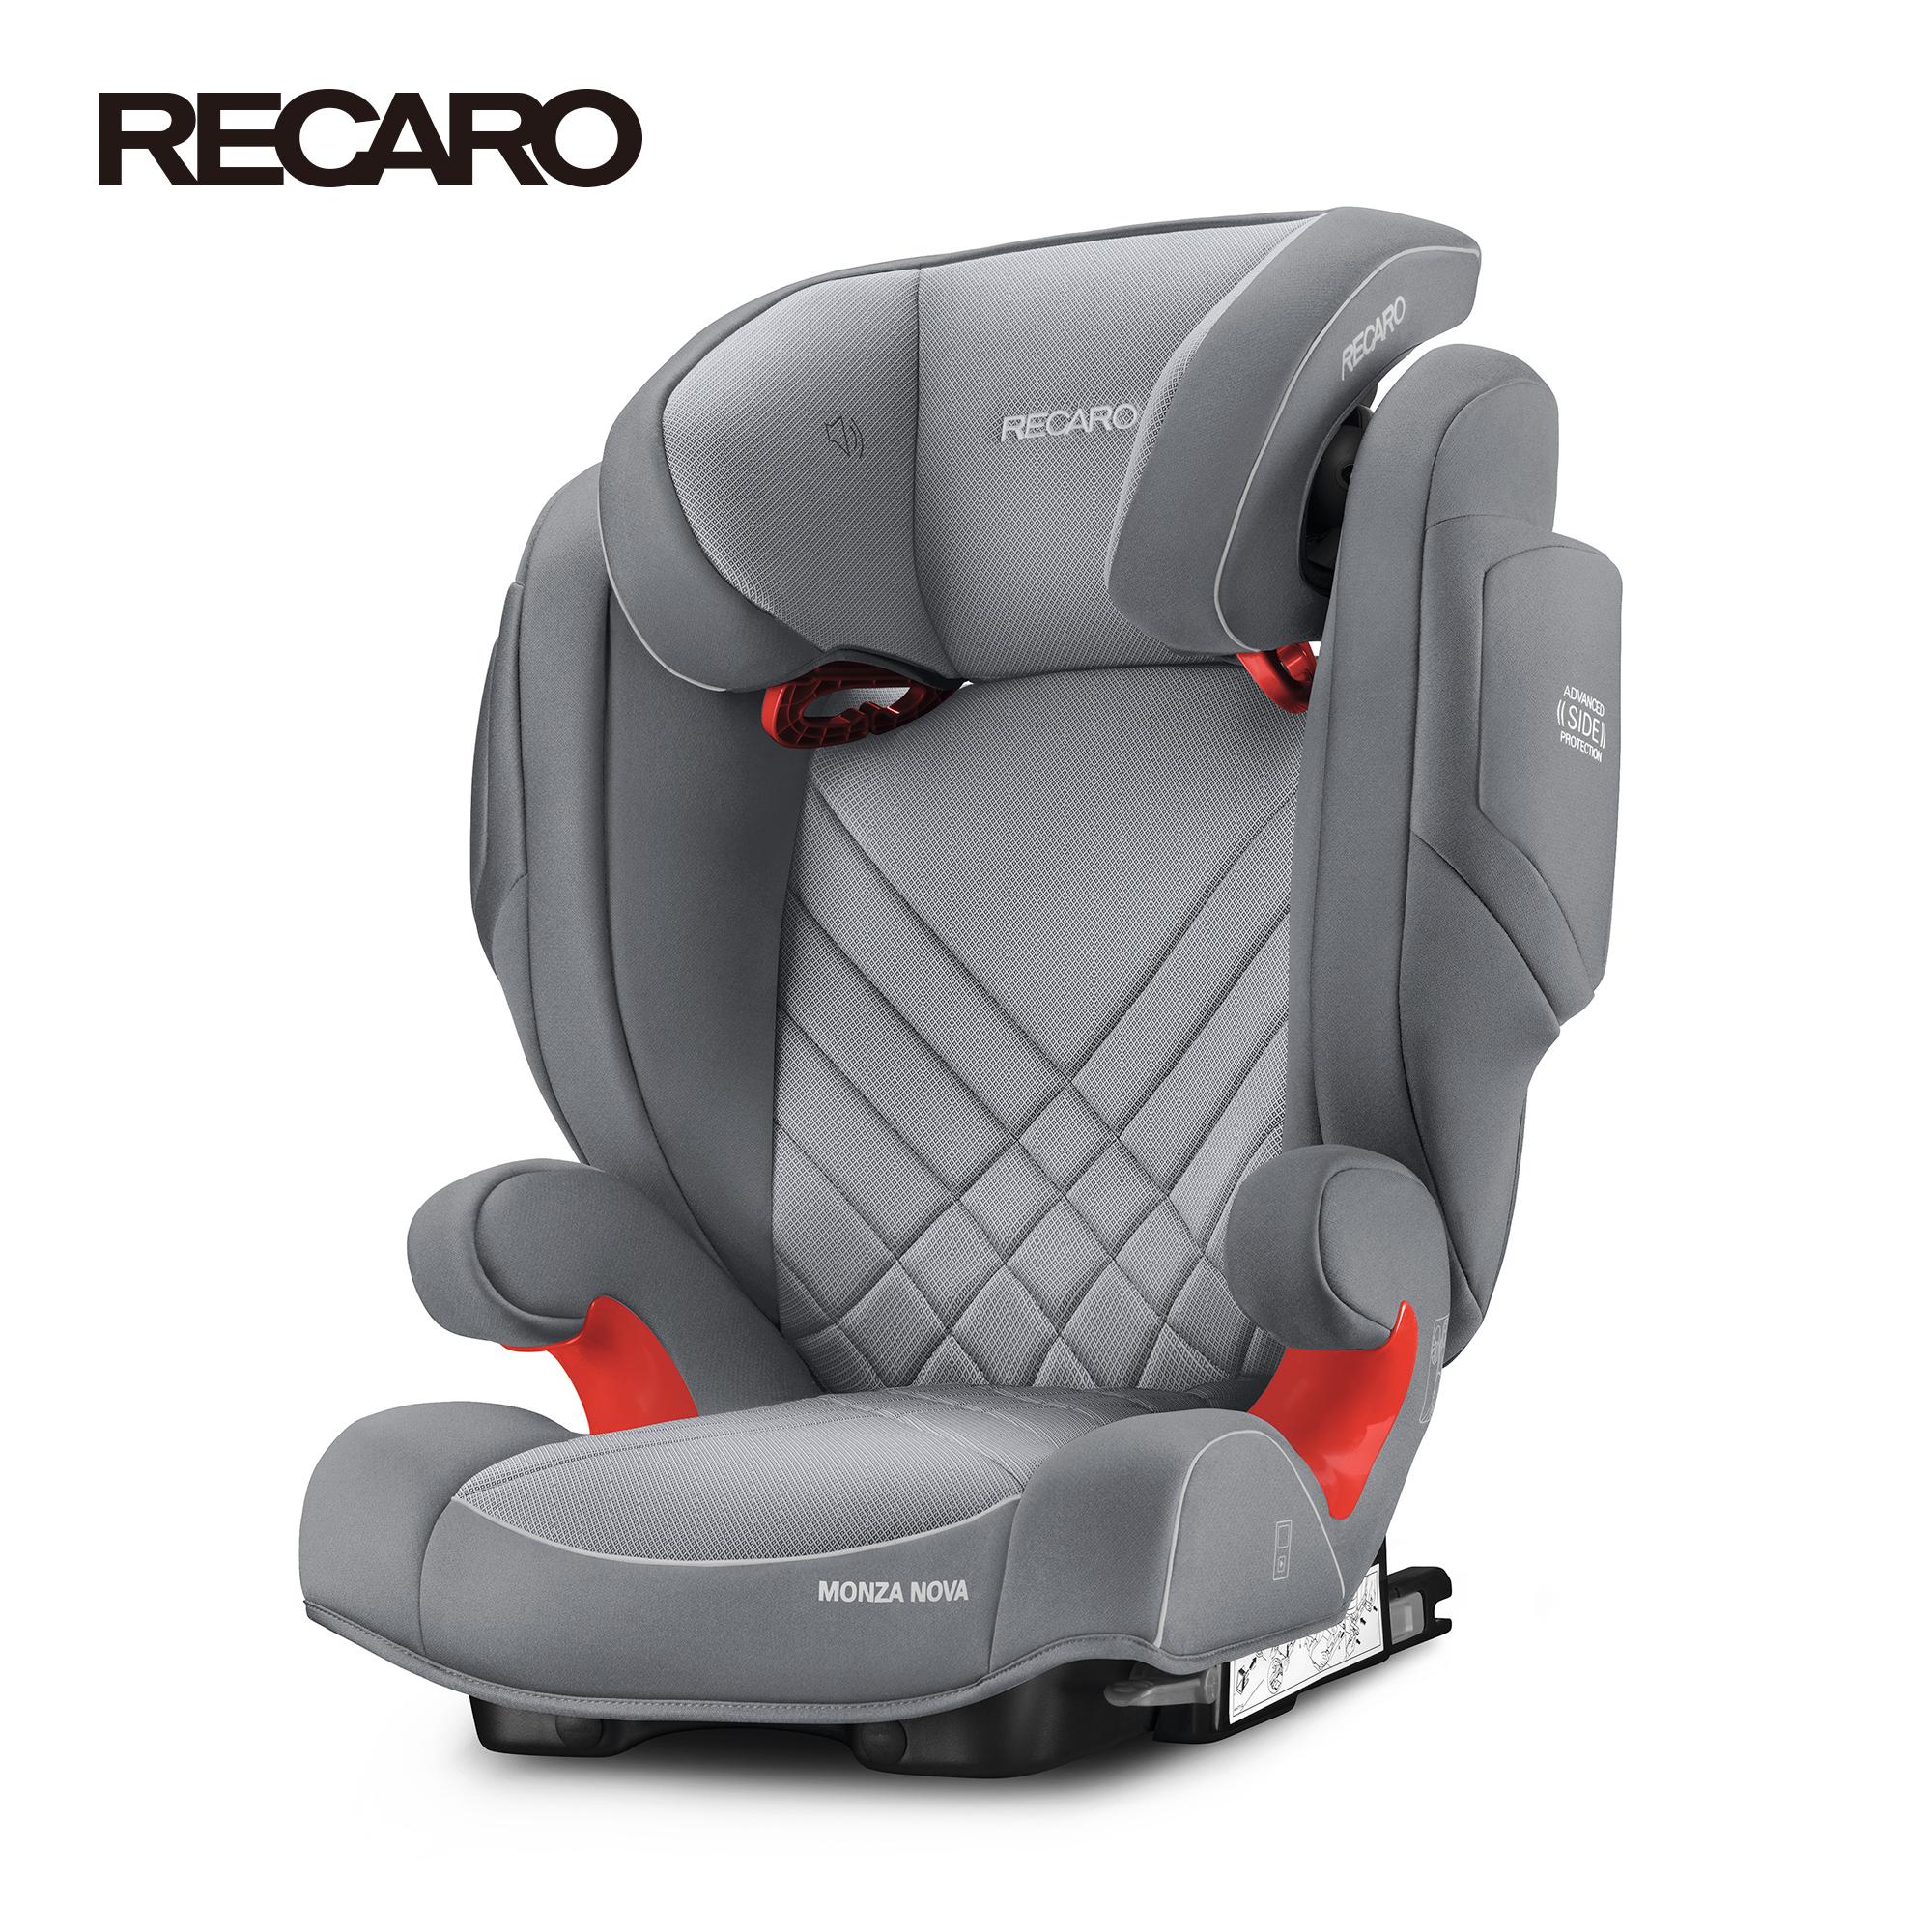 Recaro-Monza-Nova2-SF-ALUMINIUM-GREY